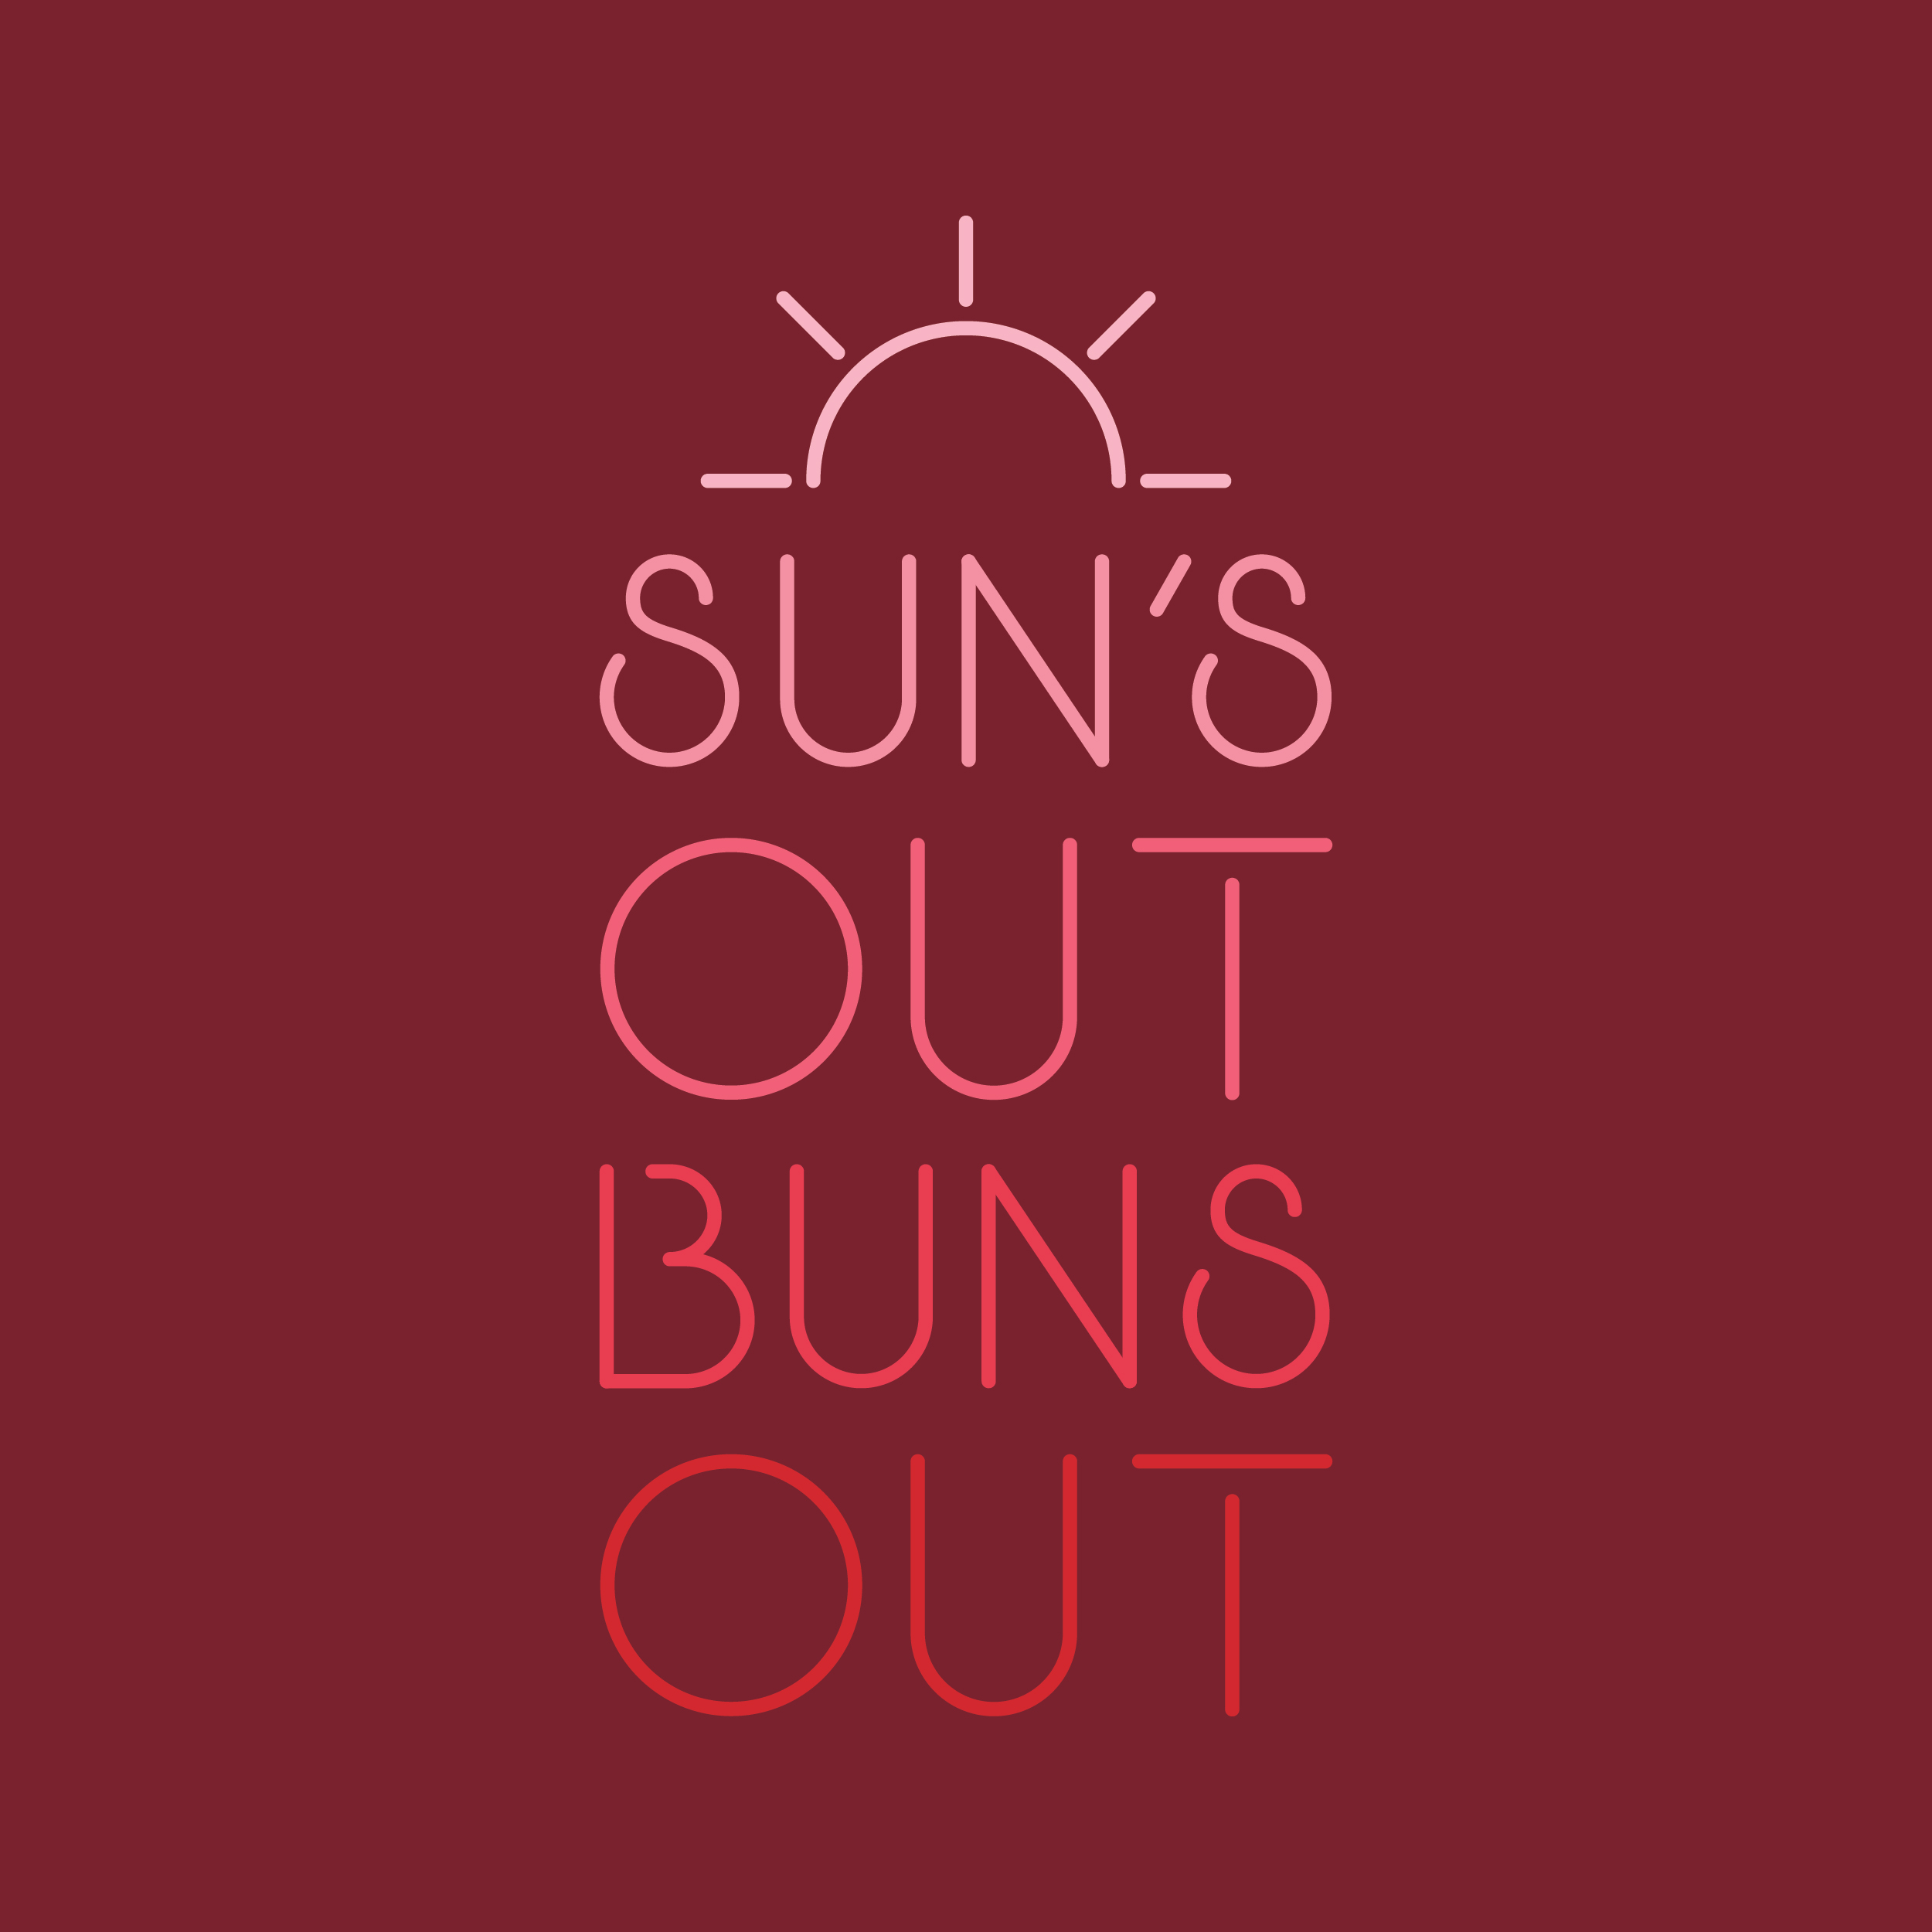 sunsout-01.jpg